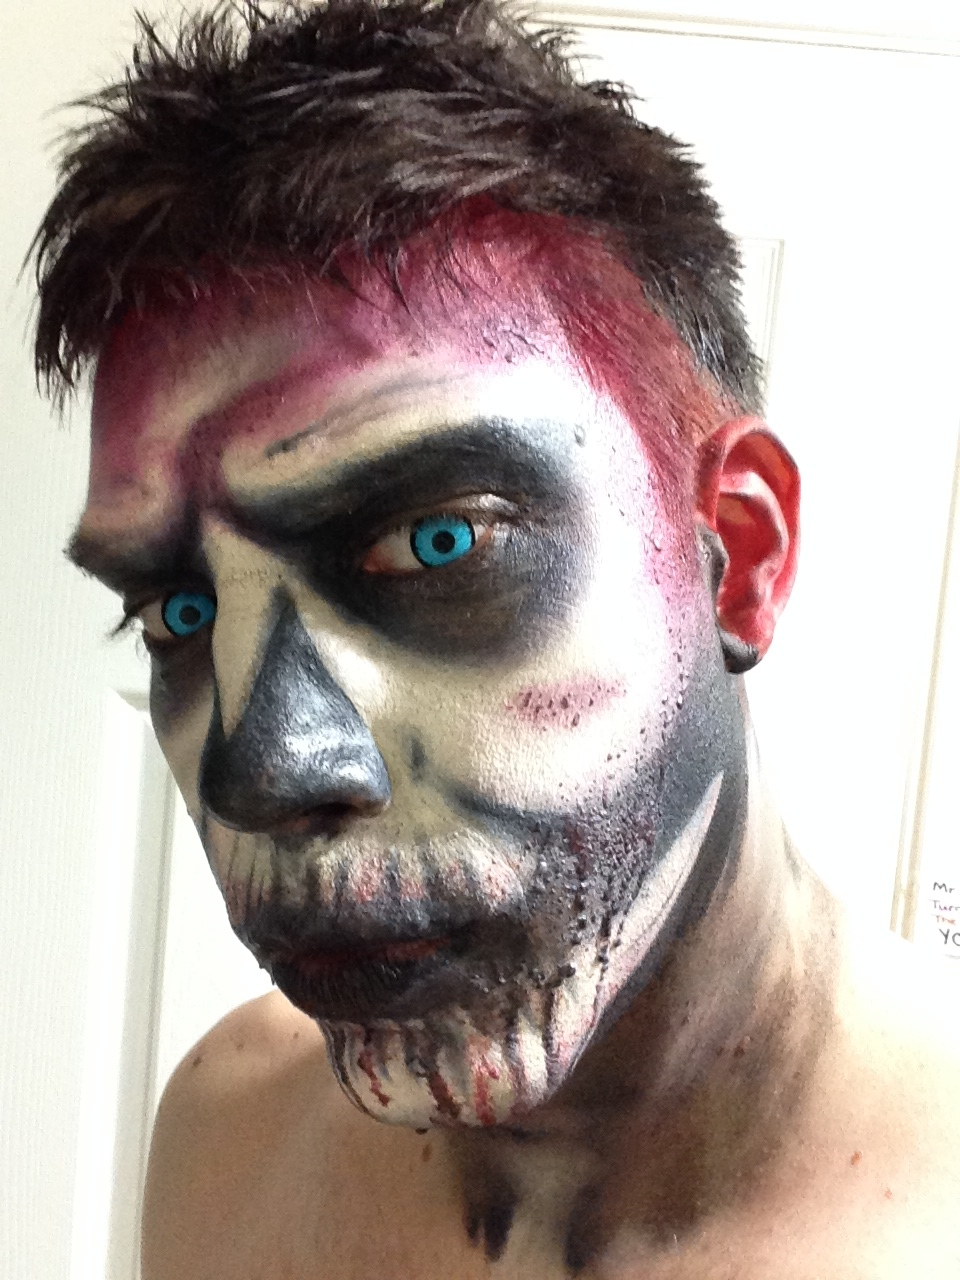 Billy Boy the Clown